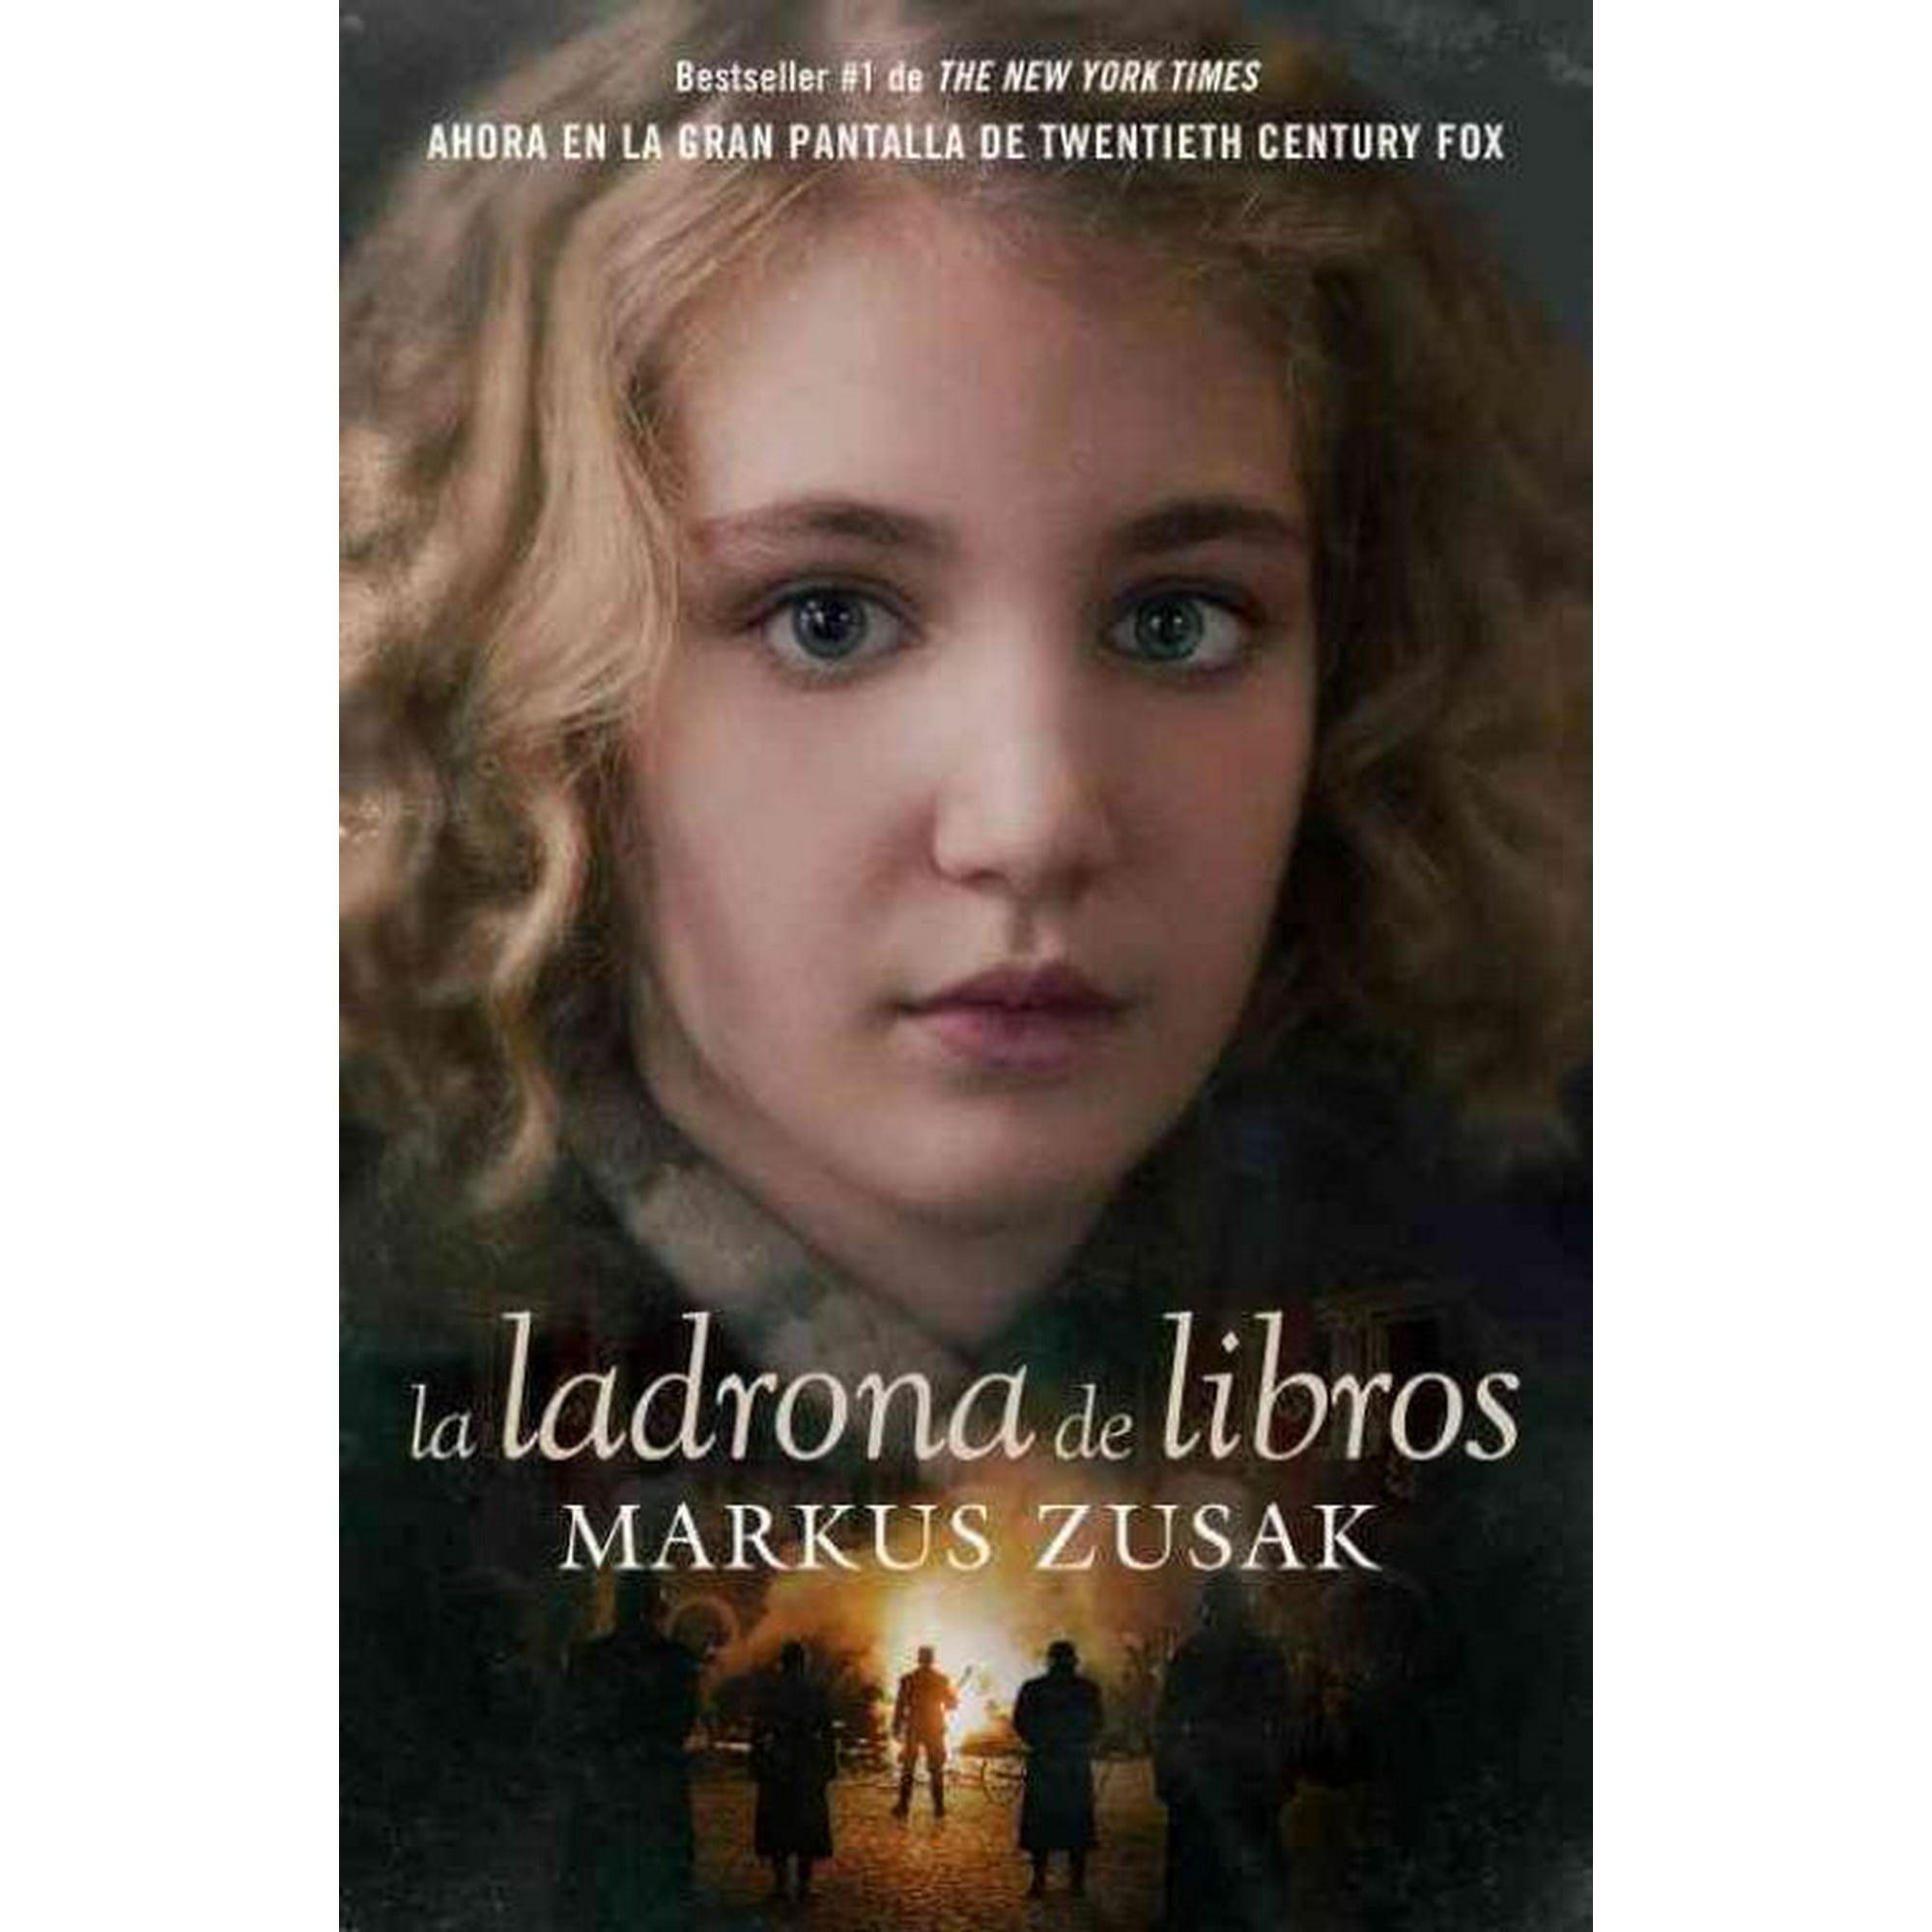 ladrona de libros/ The book thief, Markus Zusak Paperback | Walmart Canada